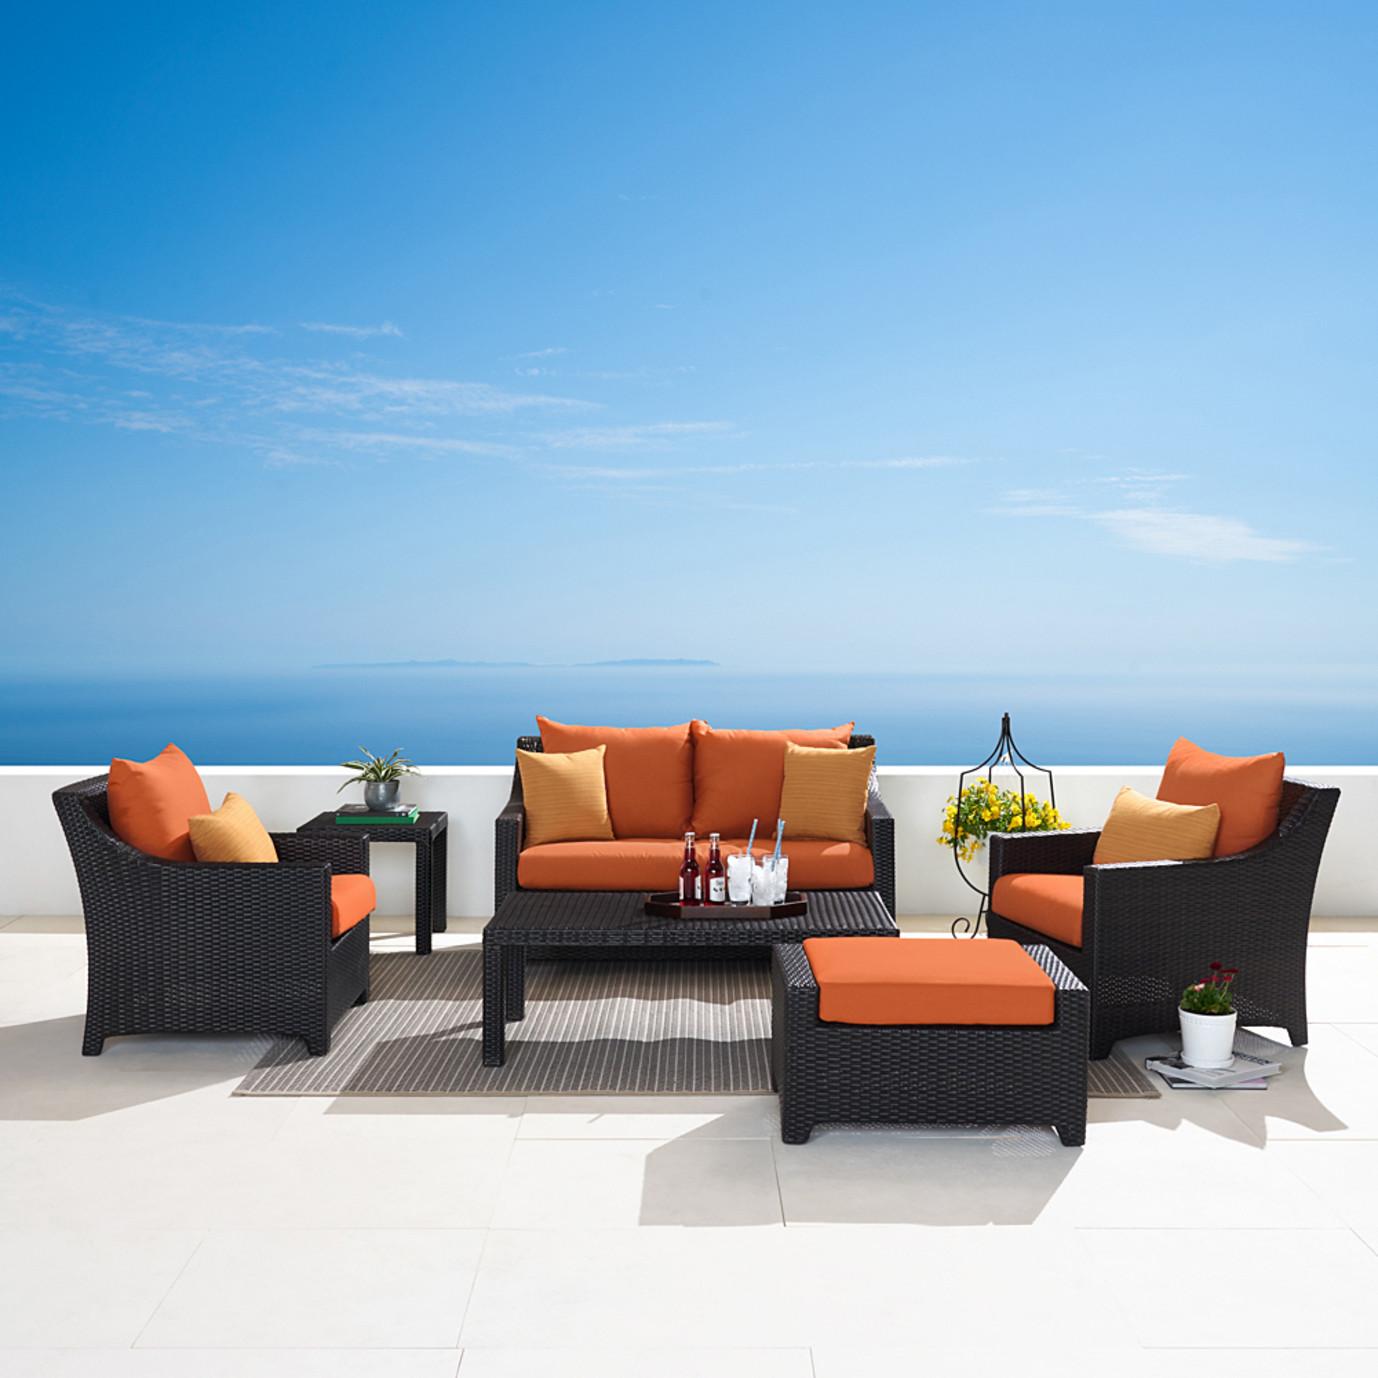 Deco™ 6 Piece Love and Club Seating Set - Tikka Orange